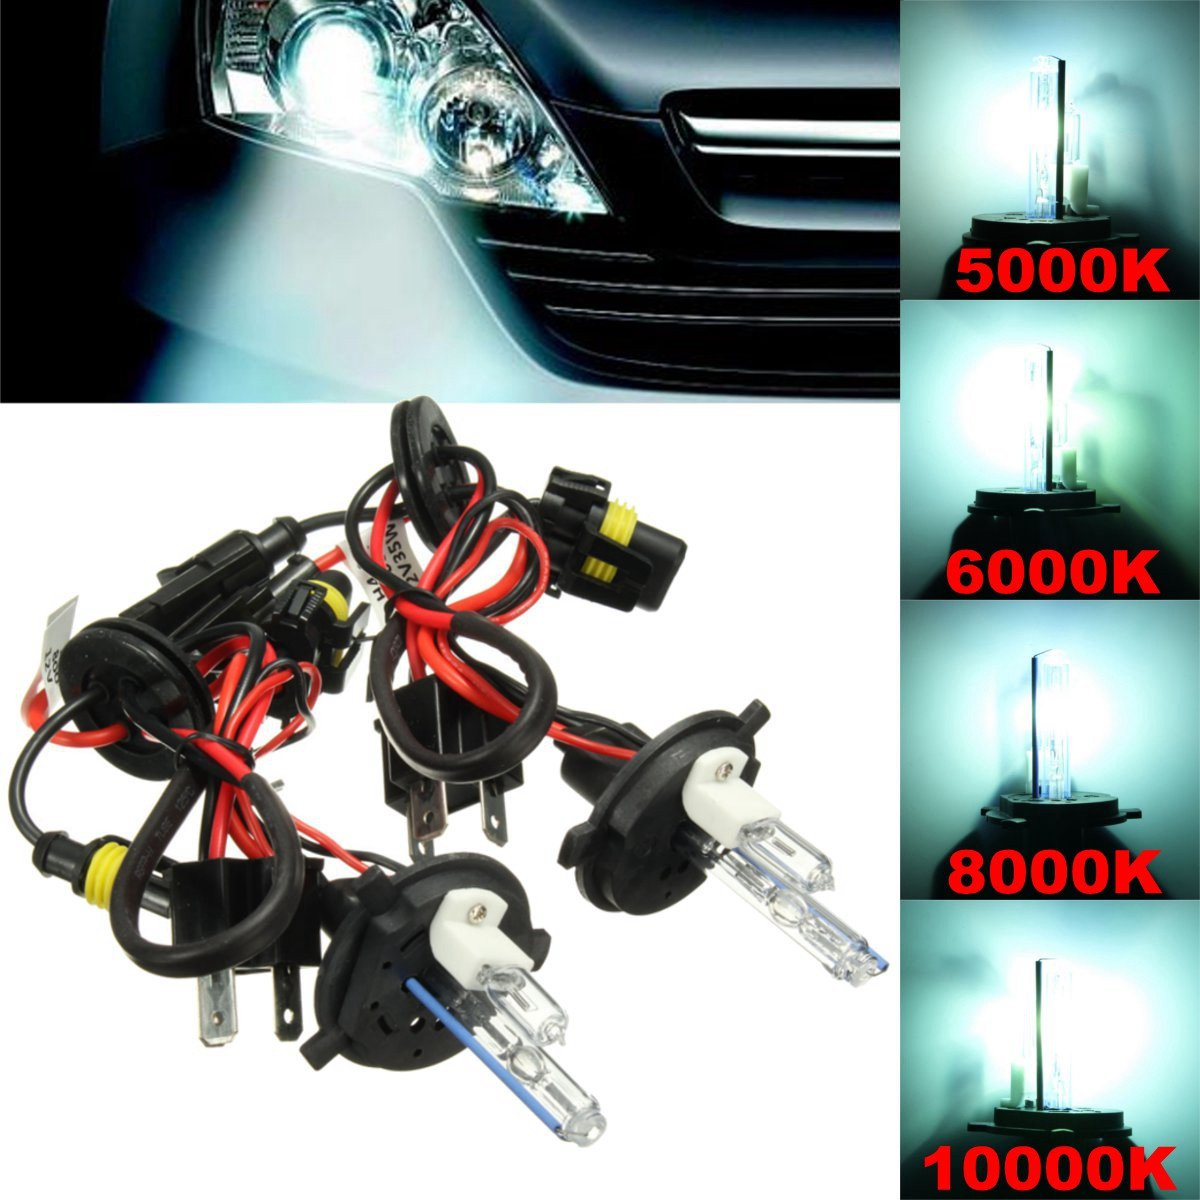 Generic Pair H4 H4-2 35W 55W Hi-Lo Dual Beam Car Xenon Headlight HID Light Bulb Lamp Kit: Amazon.in: Car & Motorbike